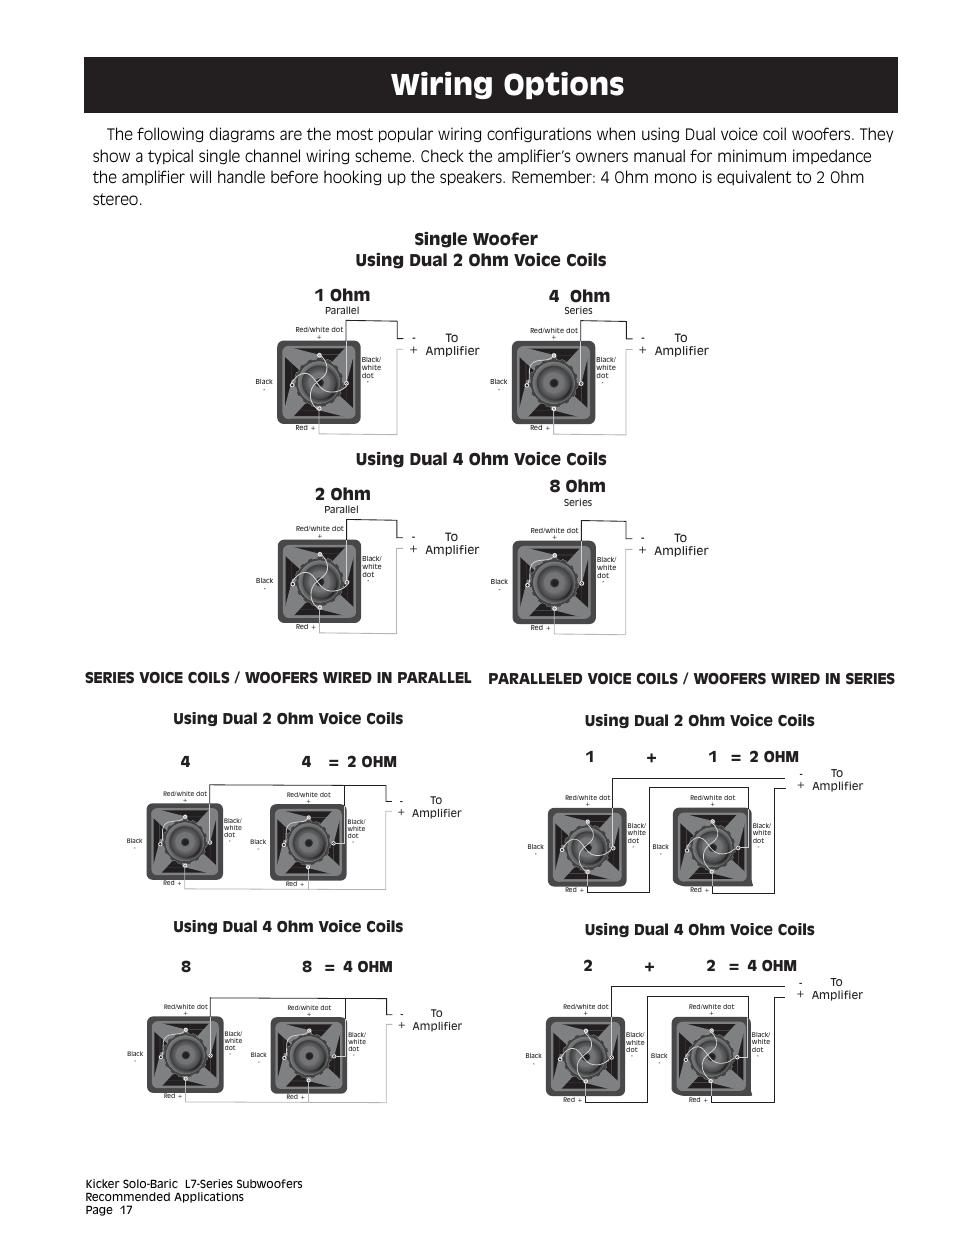 kicker l7 page17?resize\\\\\\\\\\\\\\\=665%2C861 beautiful kicker l7 2 ohm ideas images for image wire gojono com kicker l7 12 wiring diagram at bayanpartner.co